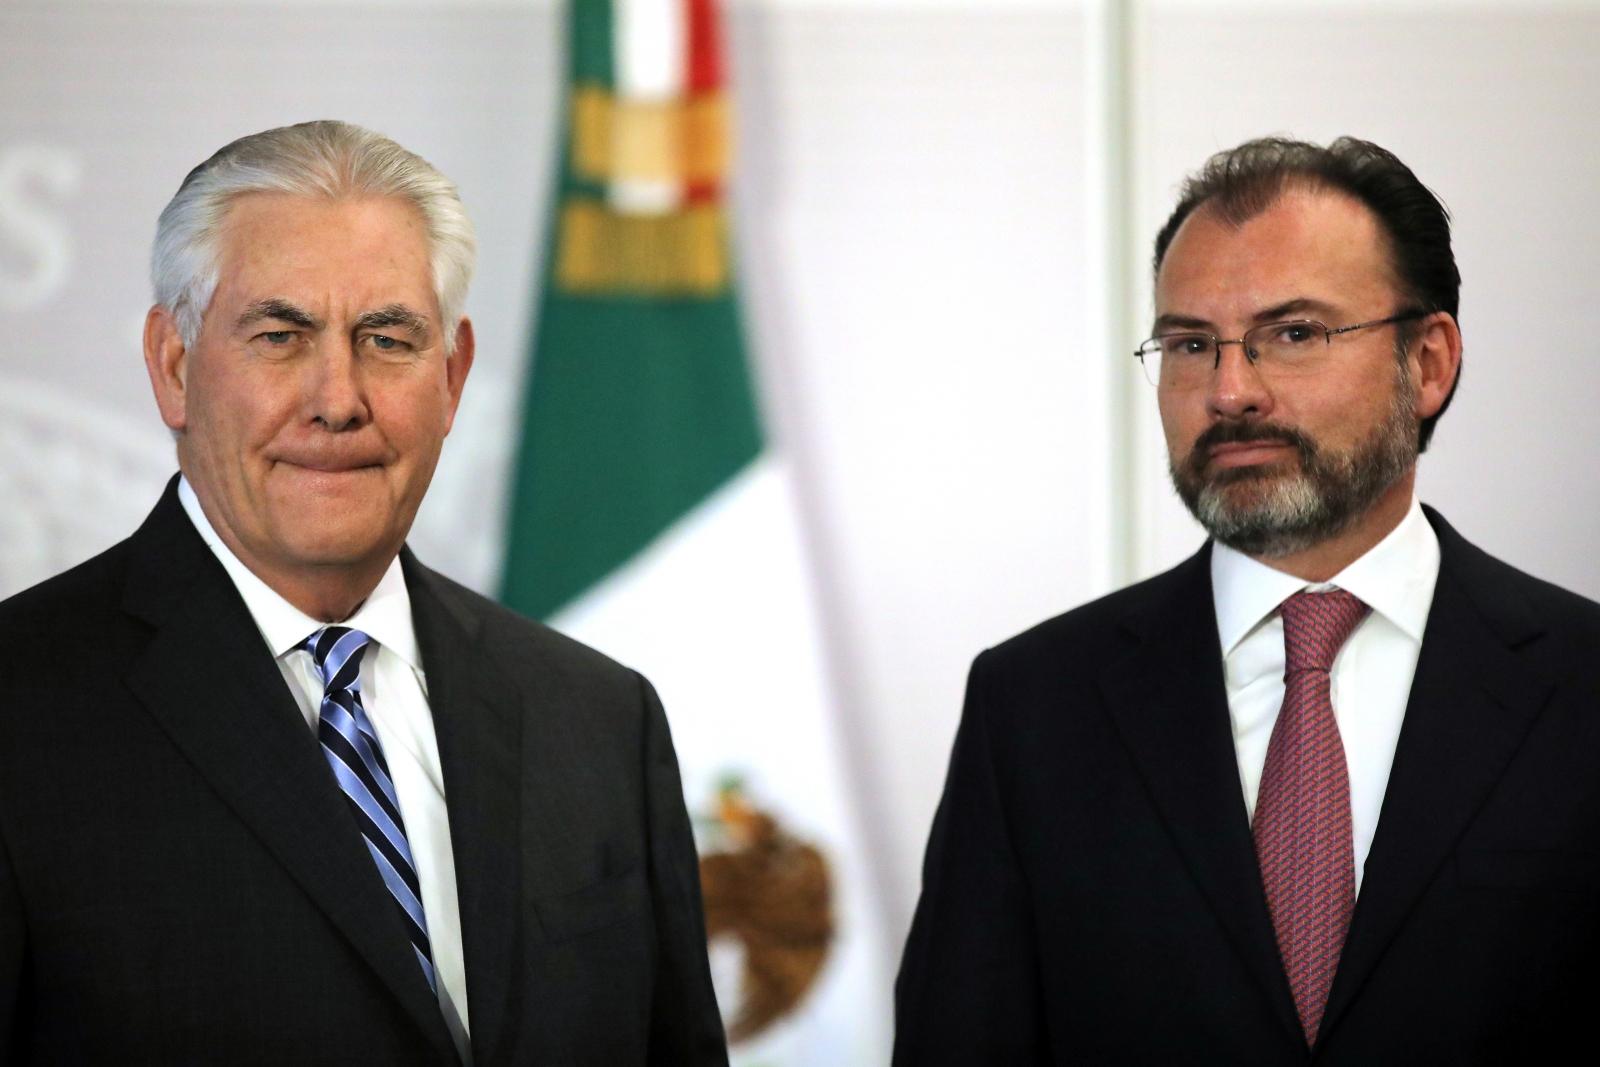 Tillerson and Videgaray